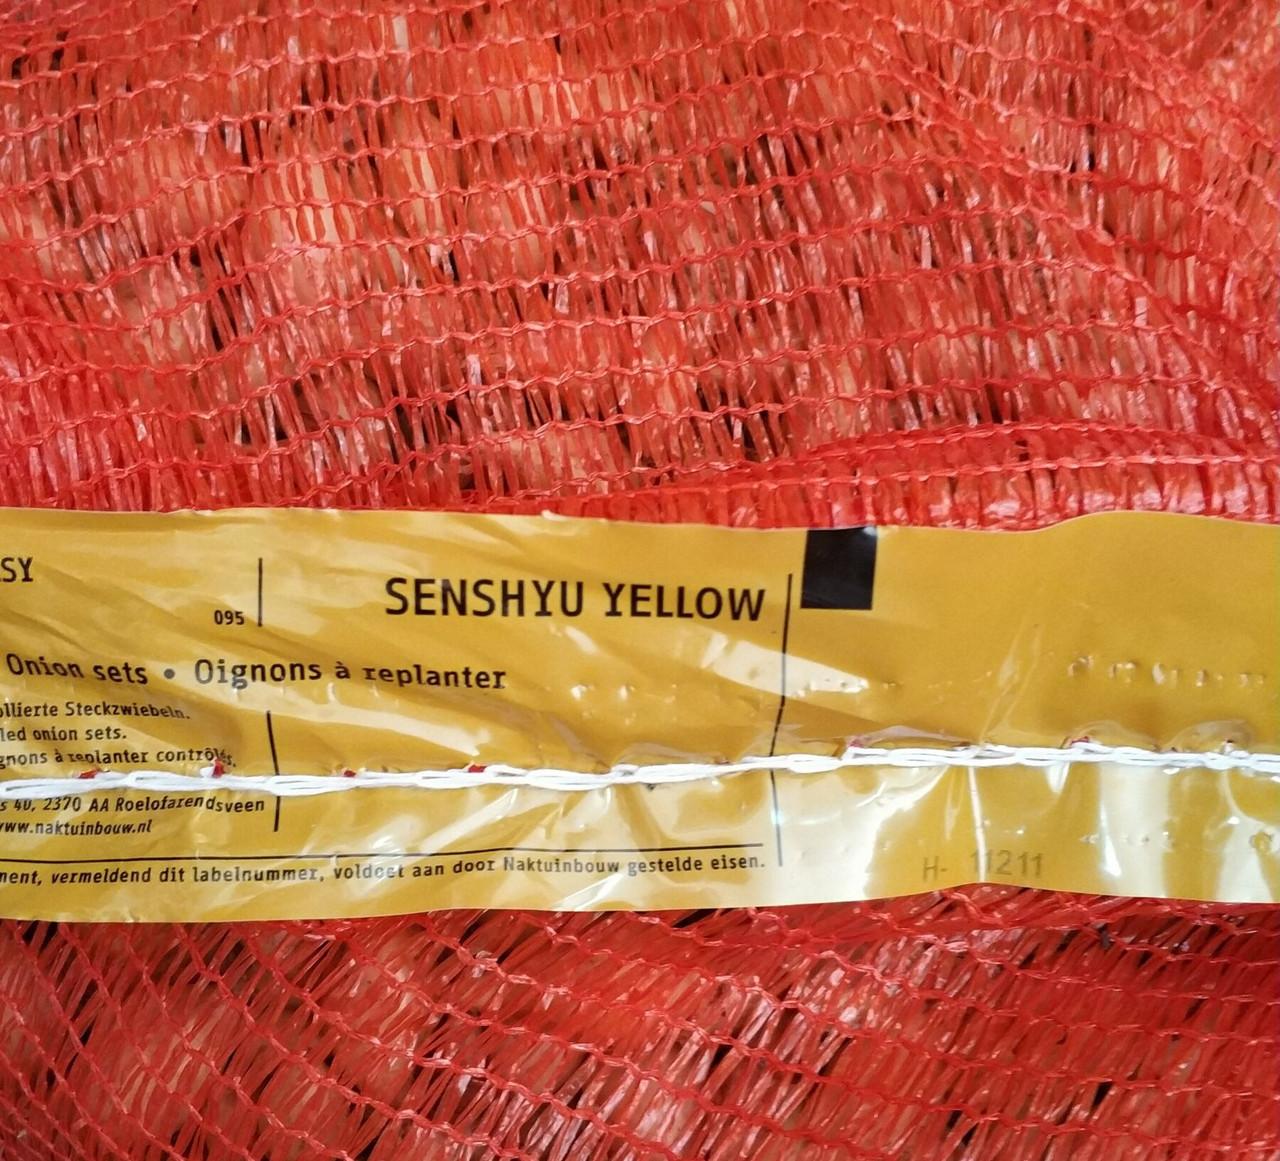 Цибуля озима Сеншуй 10кг